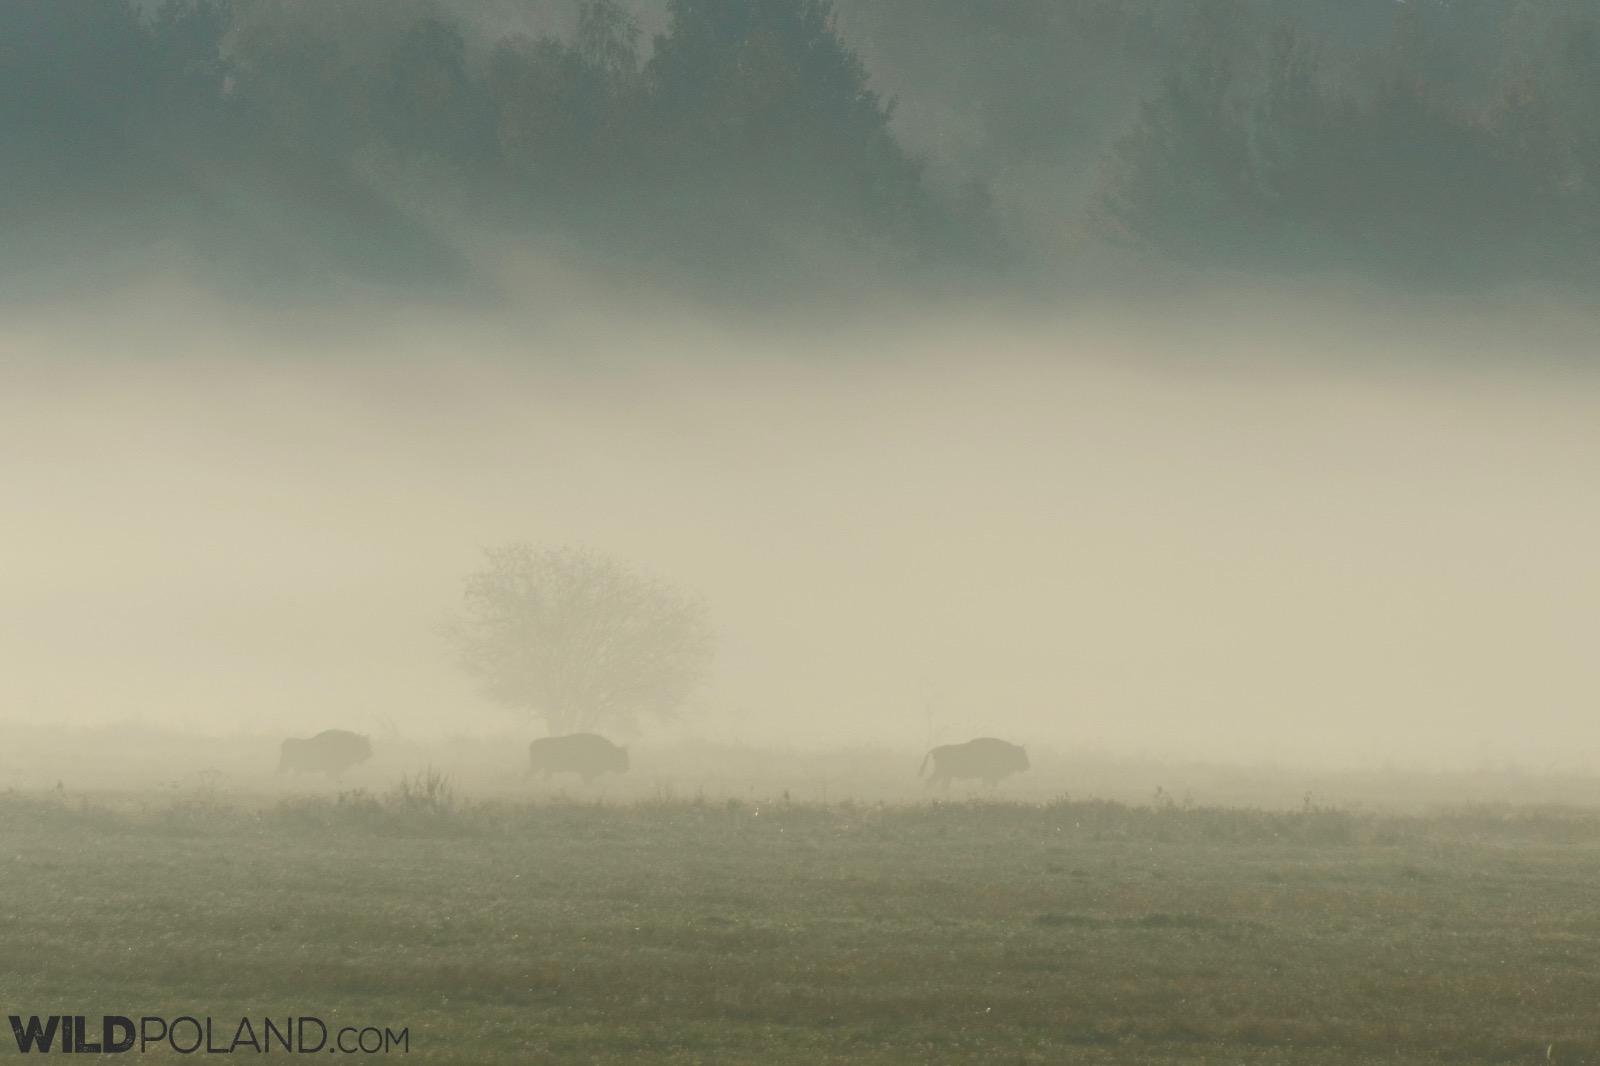 Wild Bison on a misty autumn morning, Białowieża Forest, photo by Andrzej Petryna